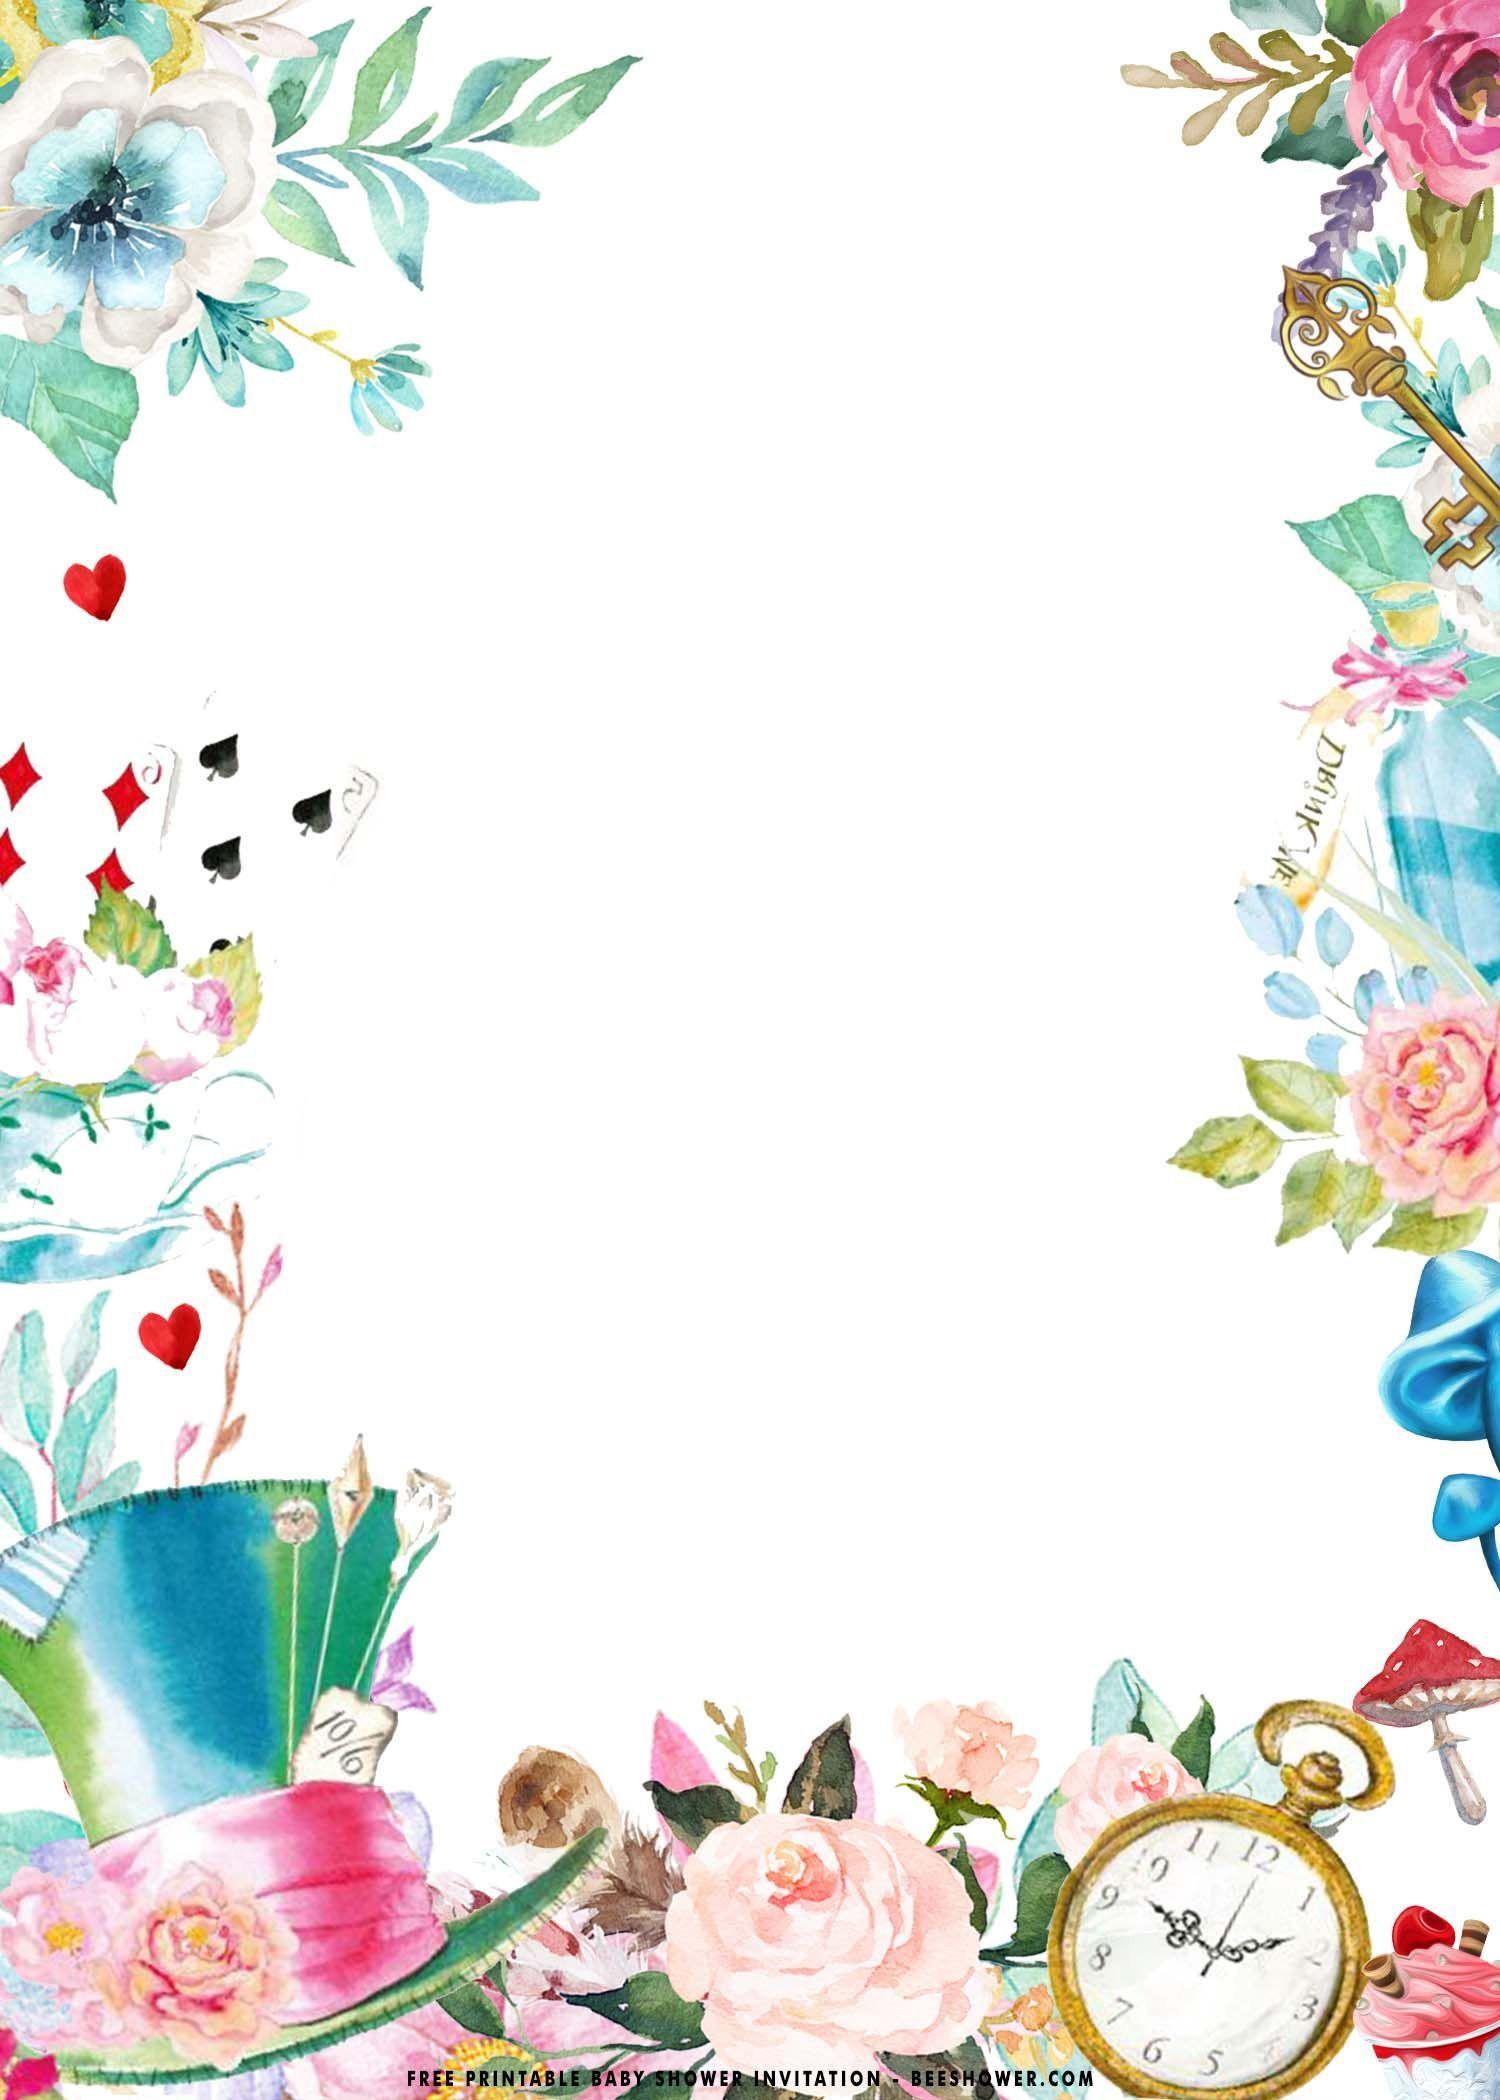 002 Fascinating Alice In Wonderland Birthday Party Invitation Printable Free Design Full